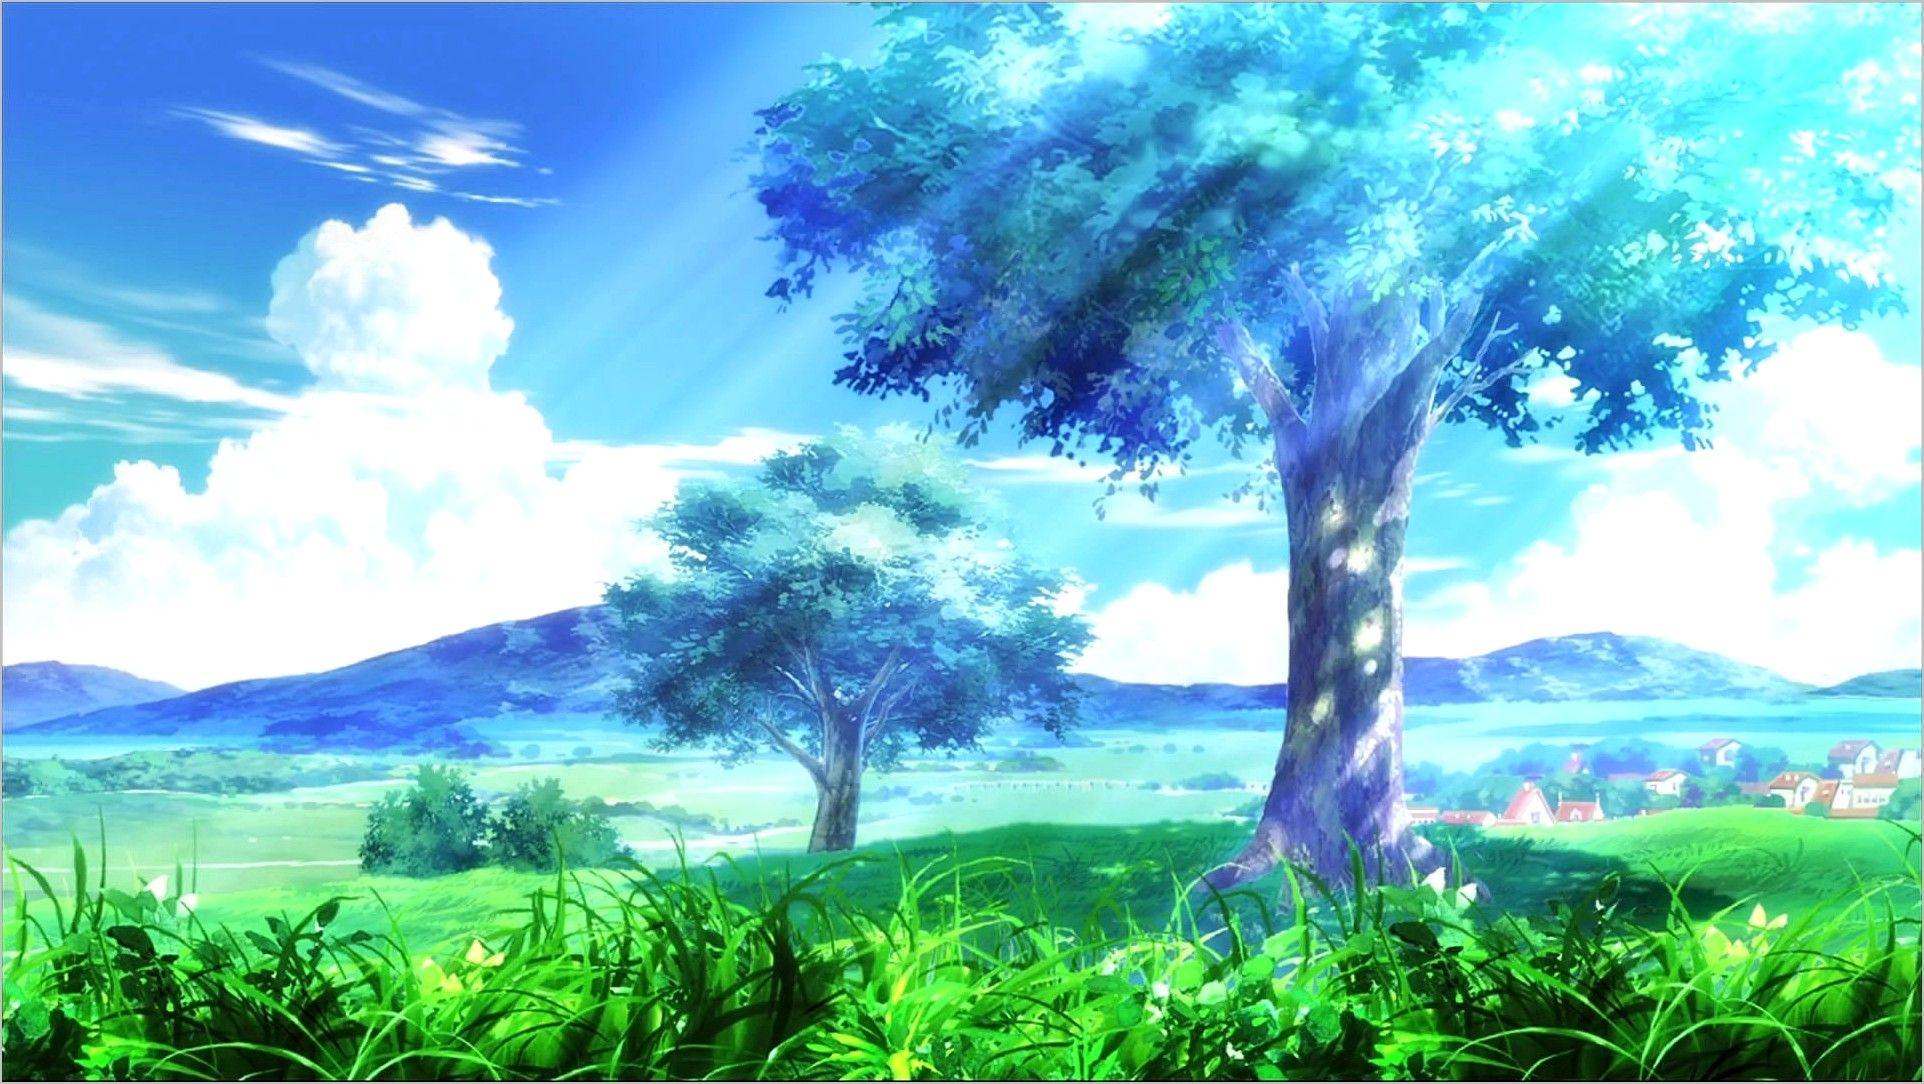 Relaxing Wallpaper Anime 4k Amazing Hd Wallpapers Anime Wallpaper Anime Scenery